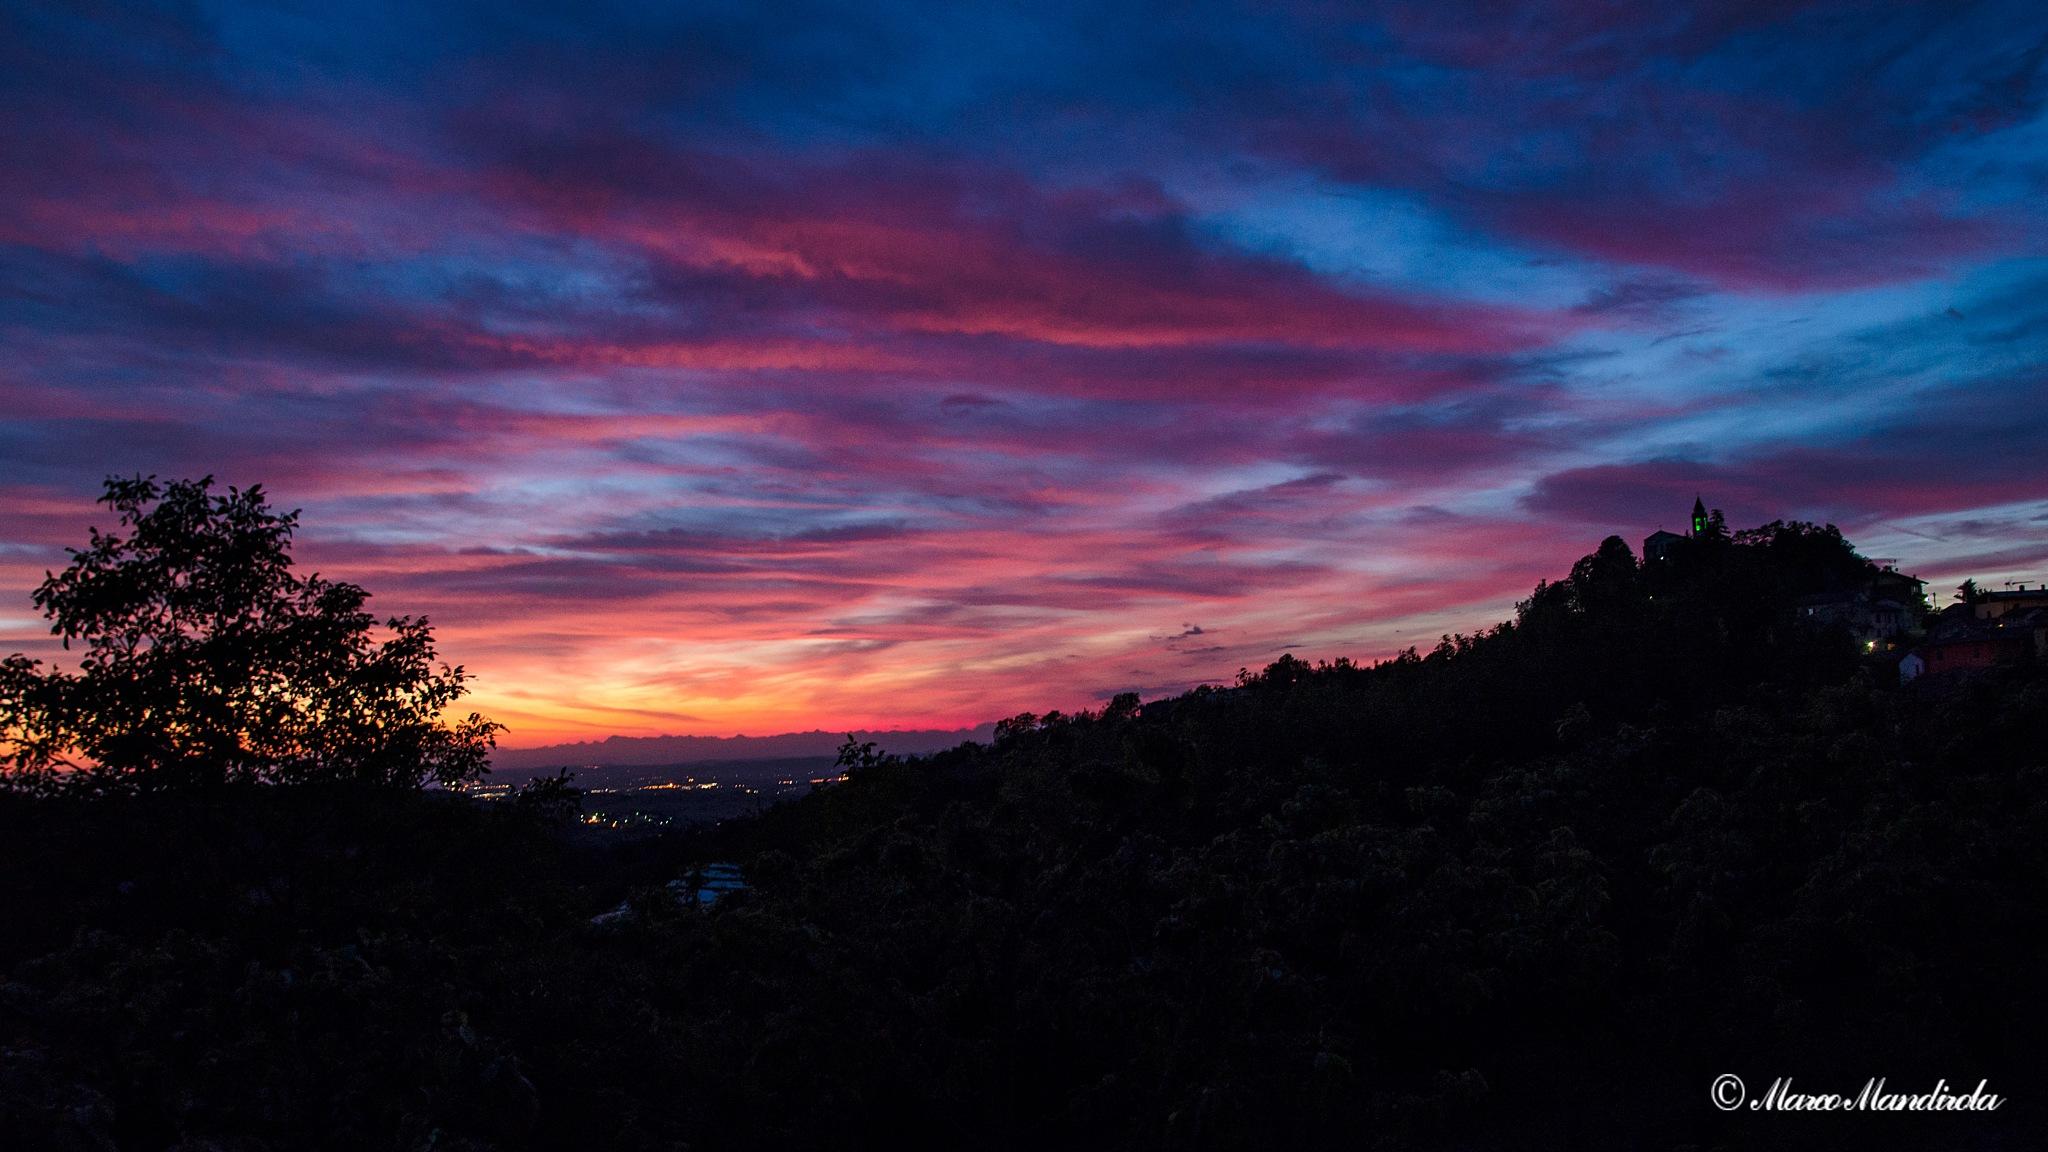 Colorful sunset by Marco Mandirola